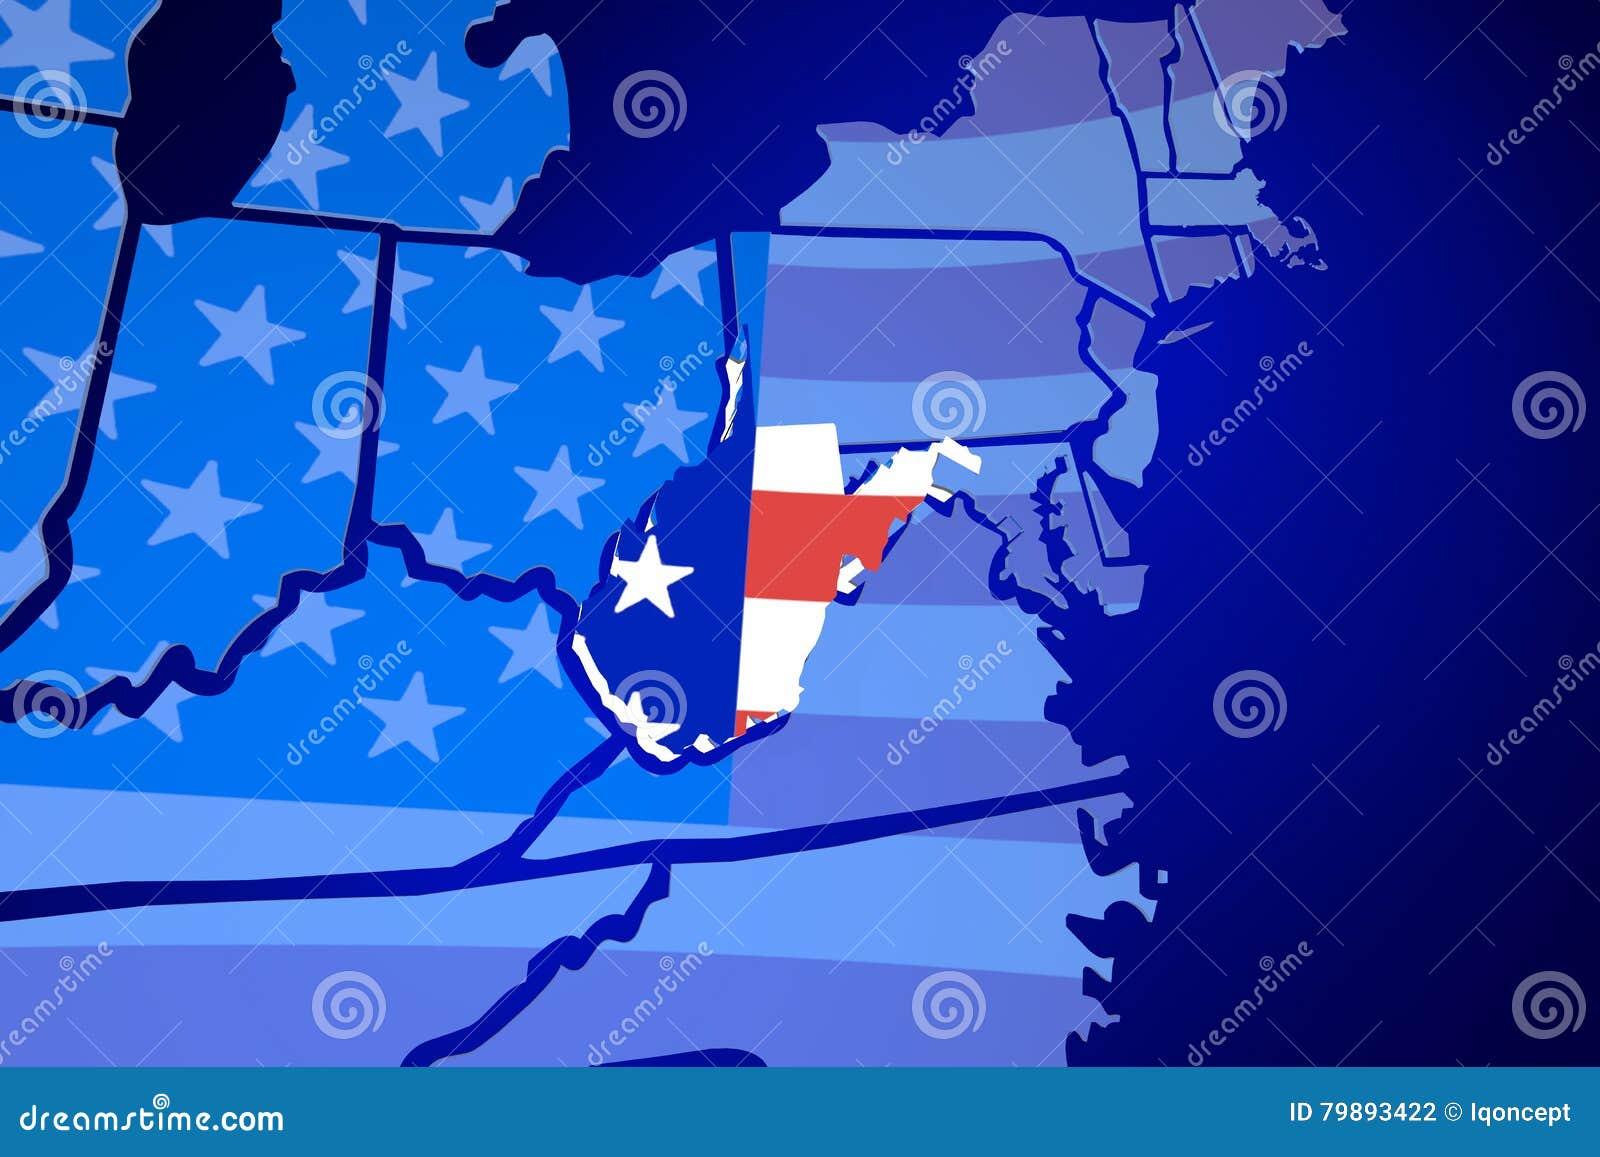 West Virginia USA United States America Flag Map Stock Illustration ...